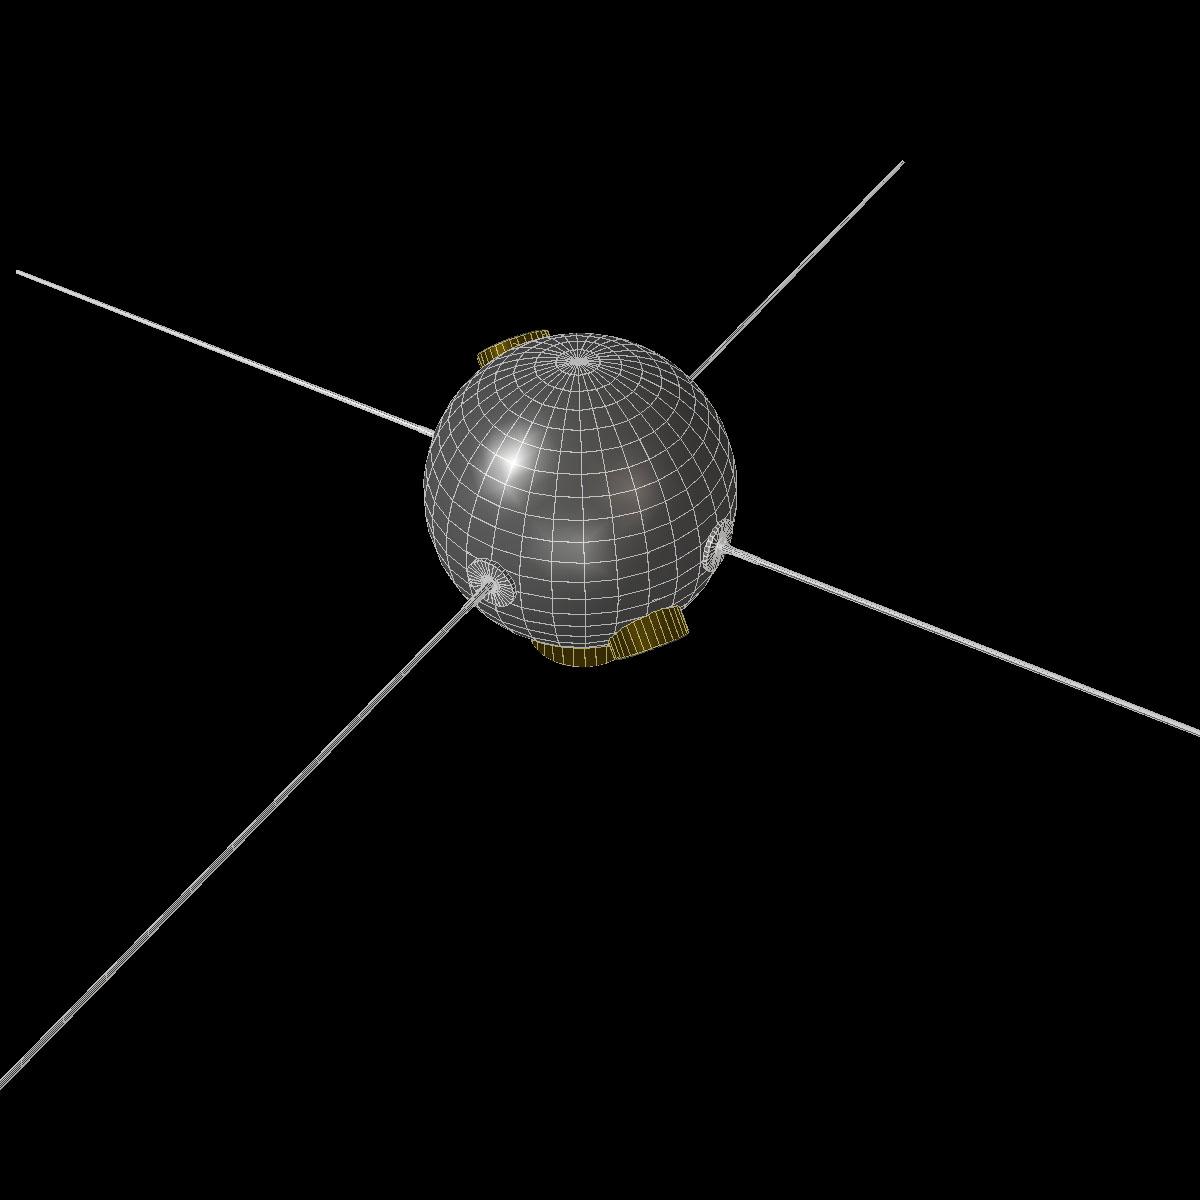 avangard ii satelit 3d model 3ds dxf fbx mješavina cob dae x obj 163943